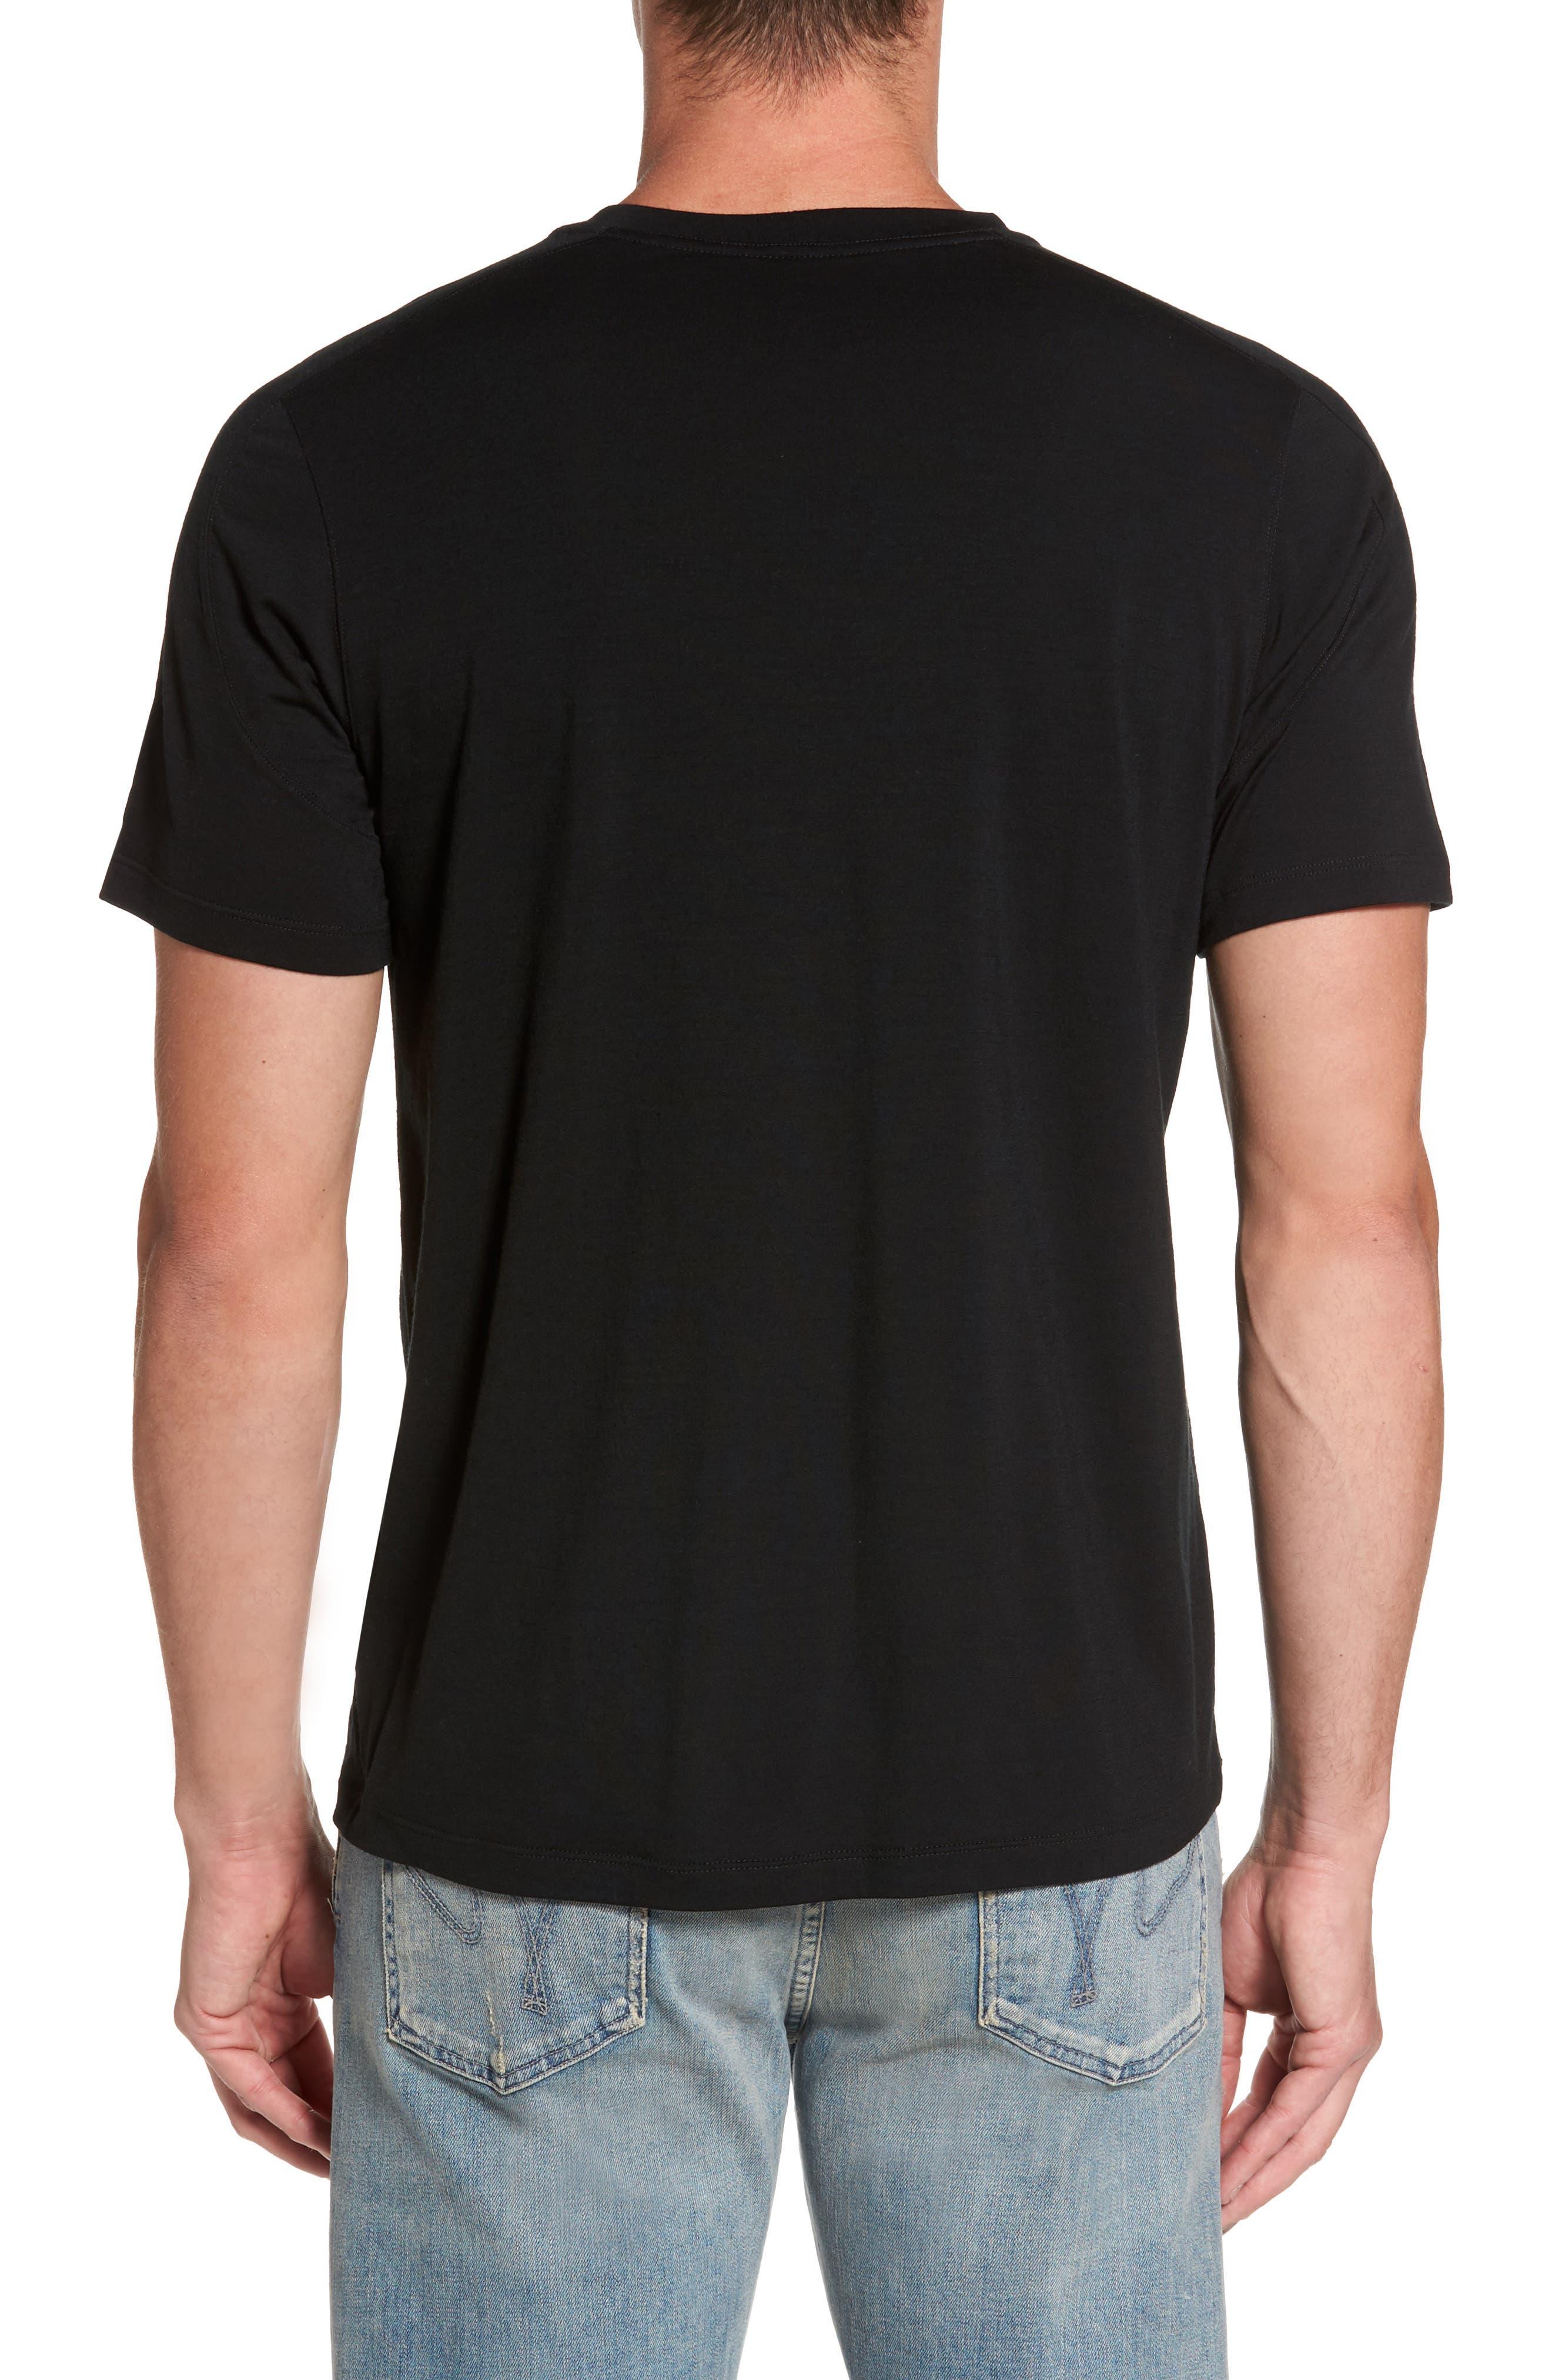 Odyssey T-Shirt,                             Alternate thumbnail 2, color,                             001